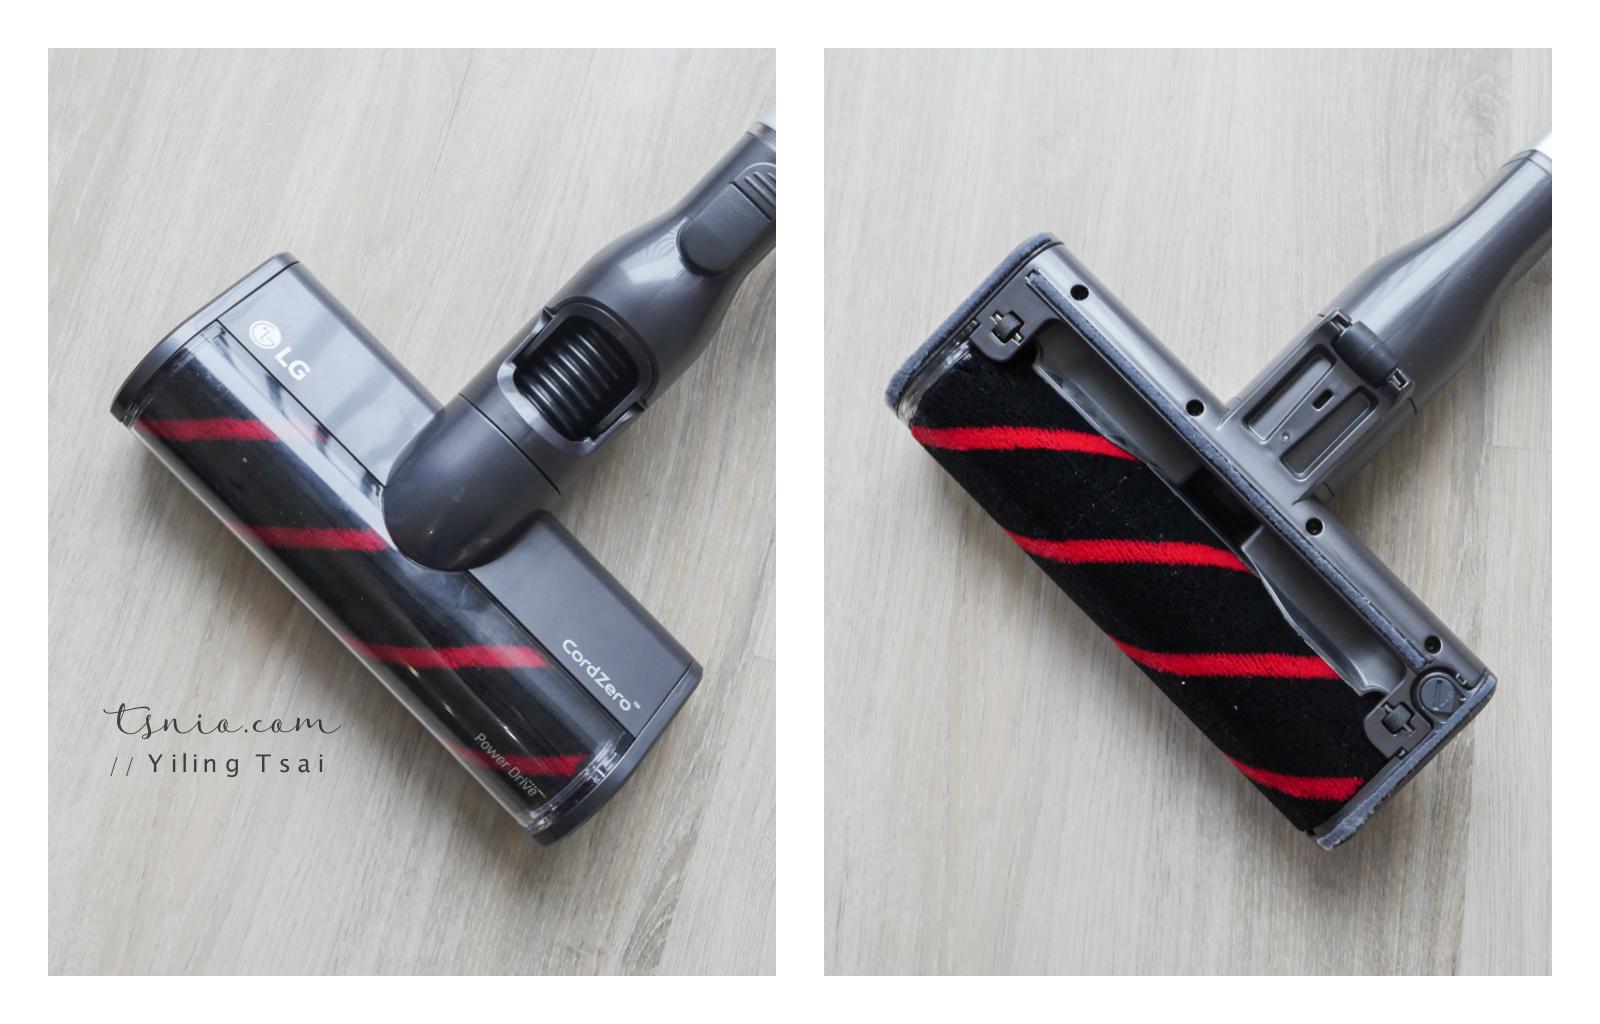 LG CordZero A9+ 快清式濕拖無線吸塵器 吸塵、濕拖、除蟎一次完成